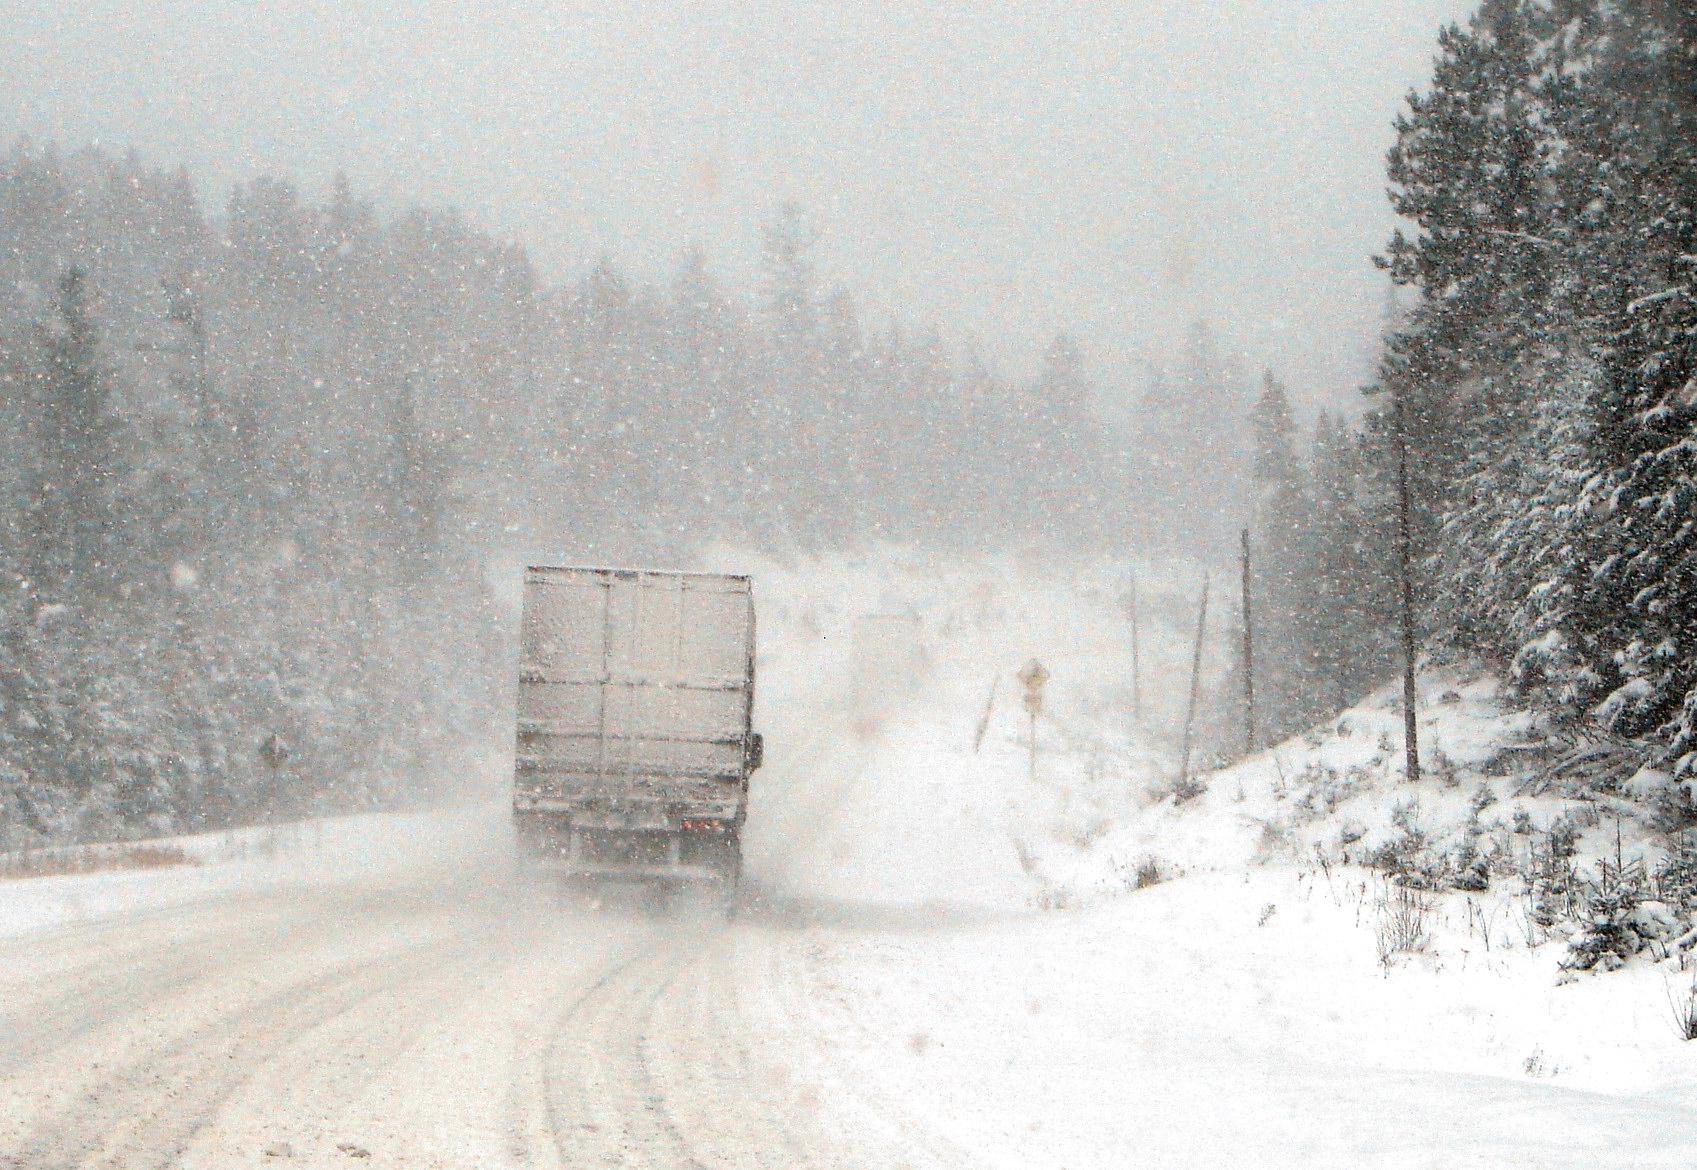 Hwy 11 Ontario Canada In Winter